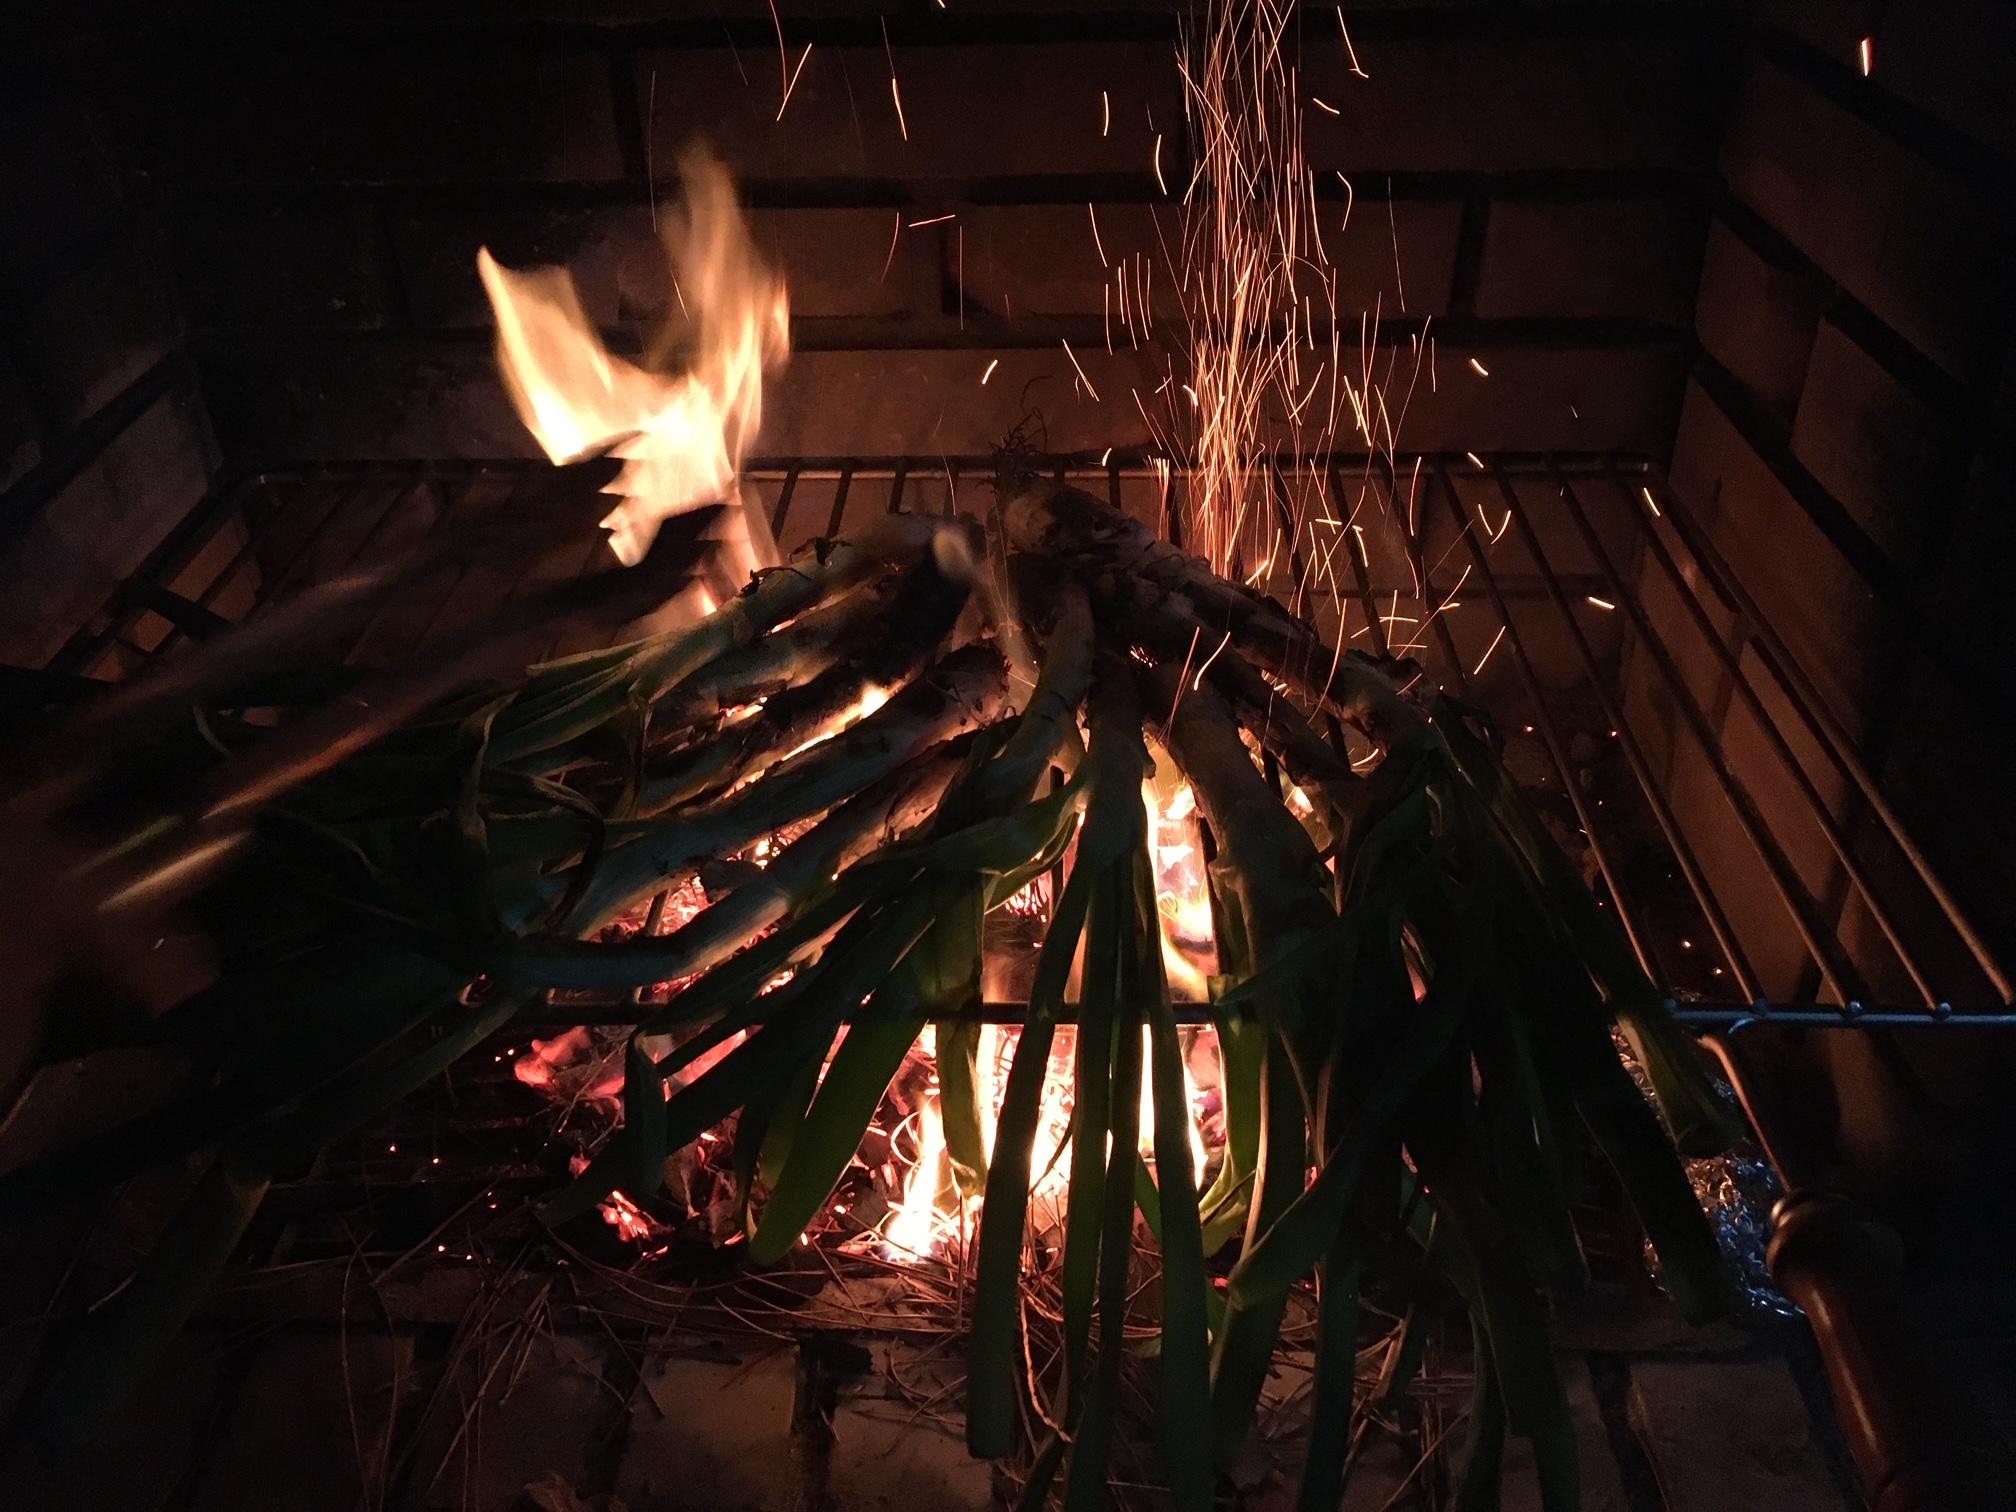 calcots-gegrillte-zeibeln-romesco-sauce-katalonien-barcelona-winter (3)